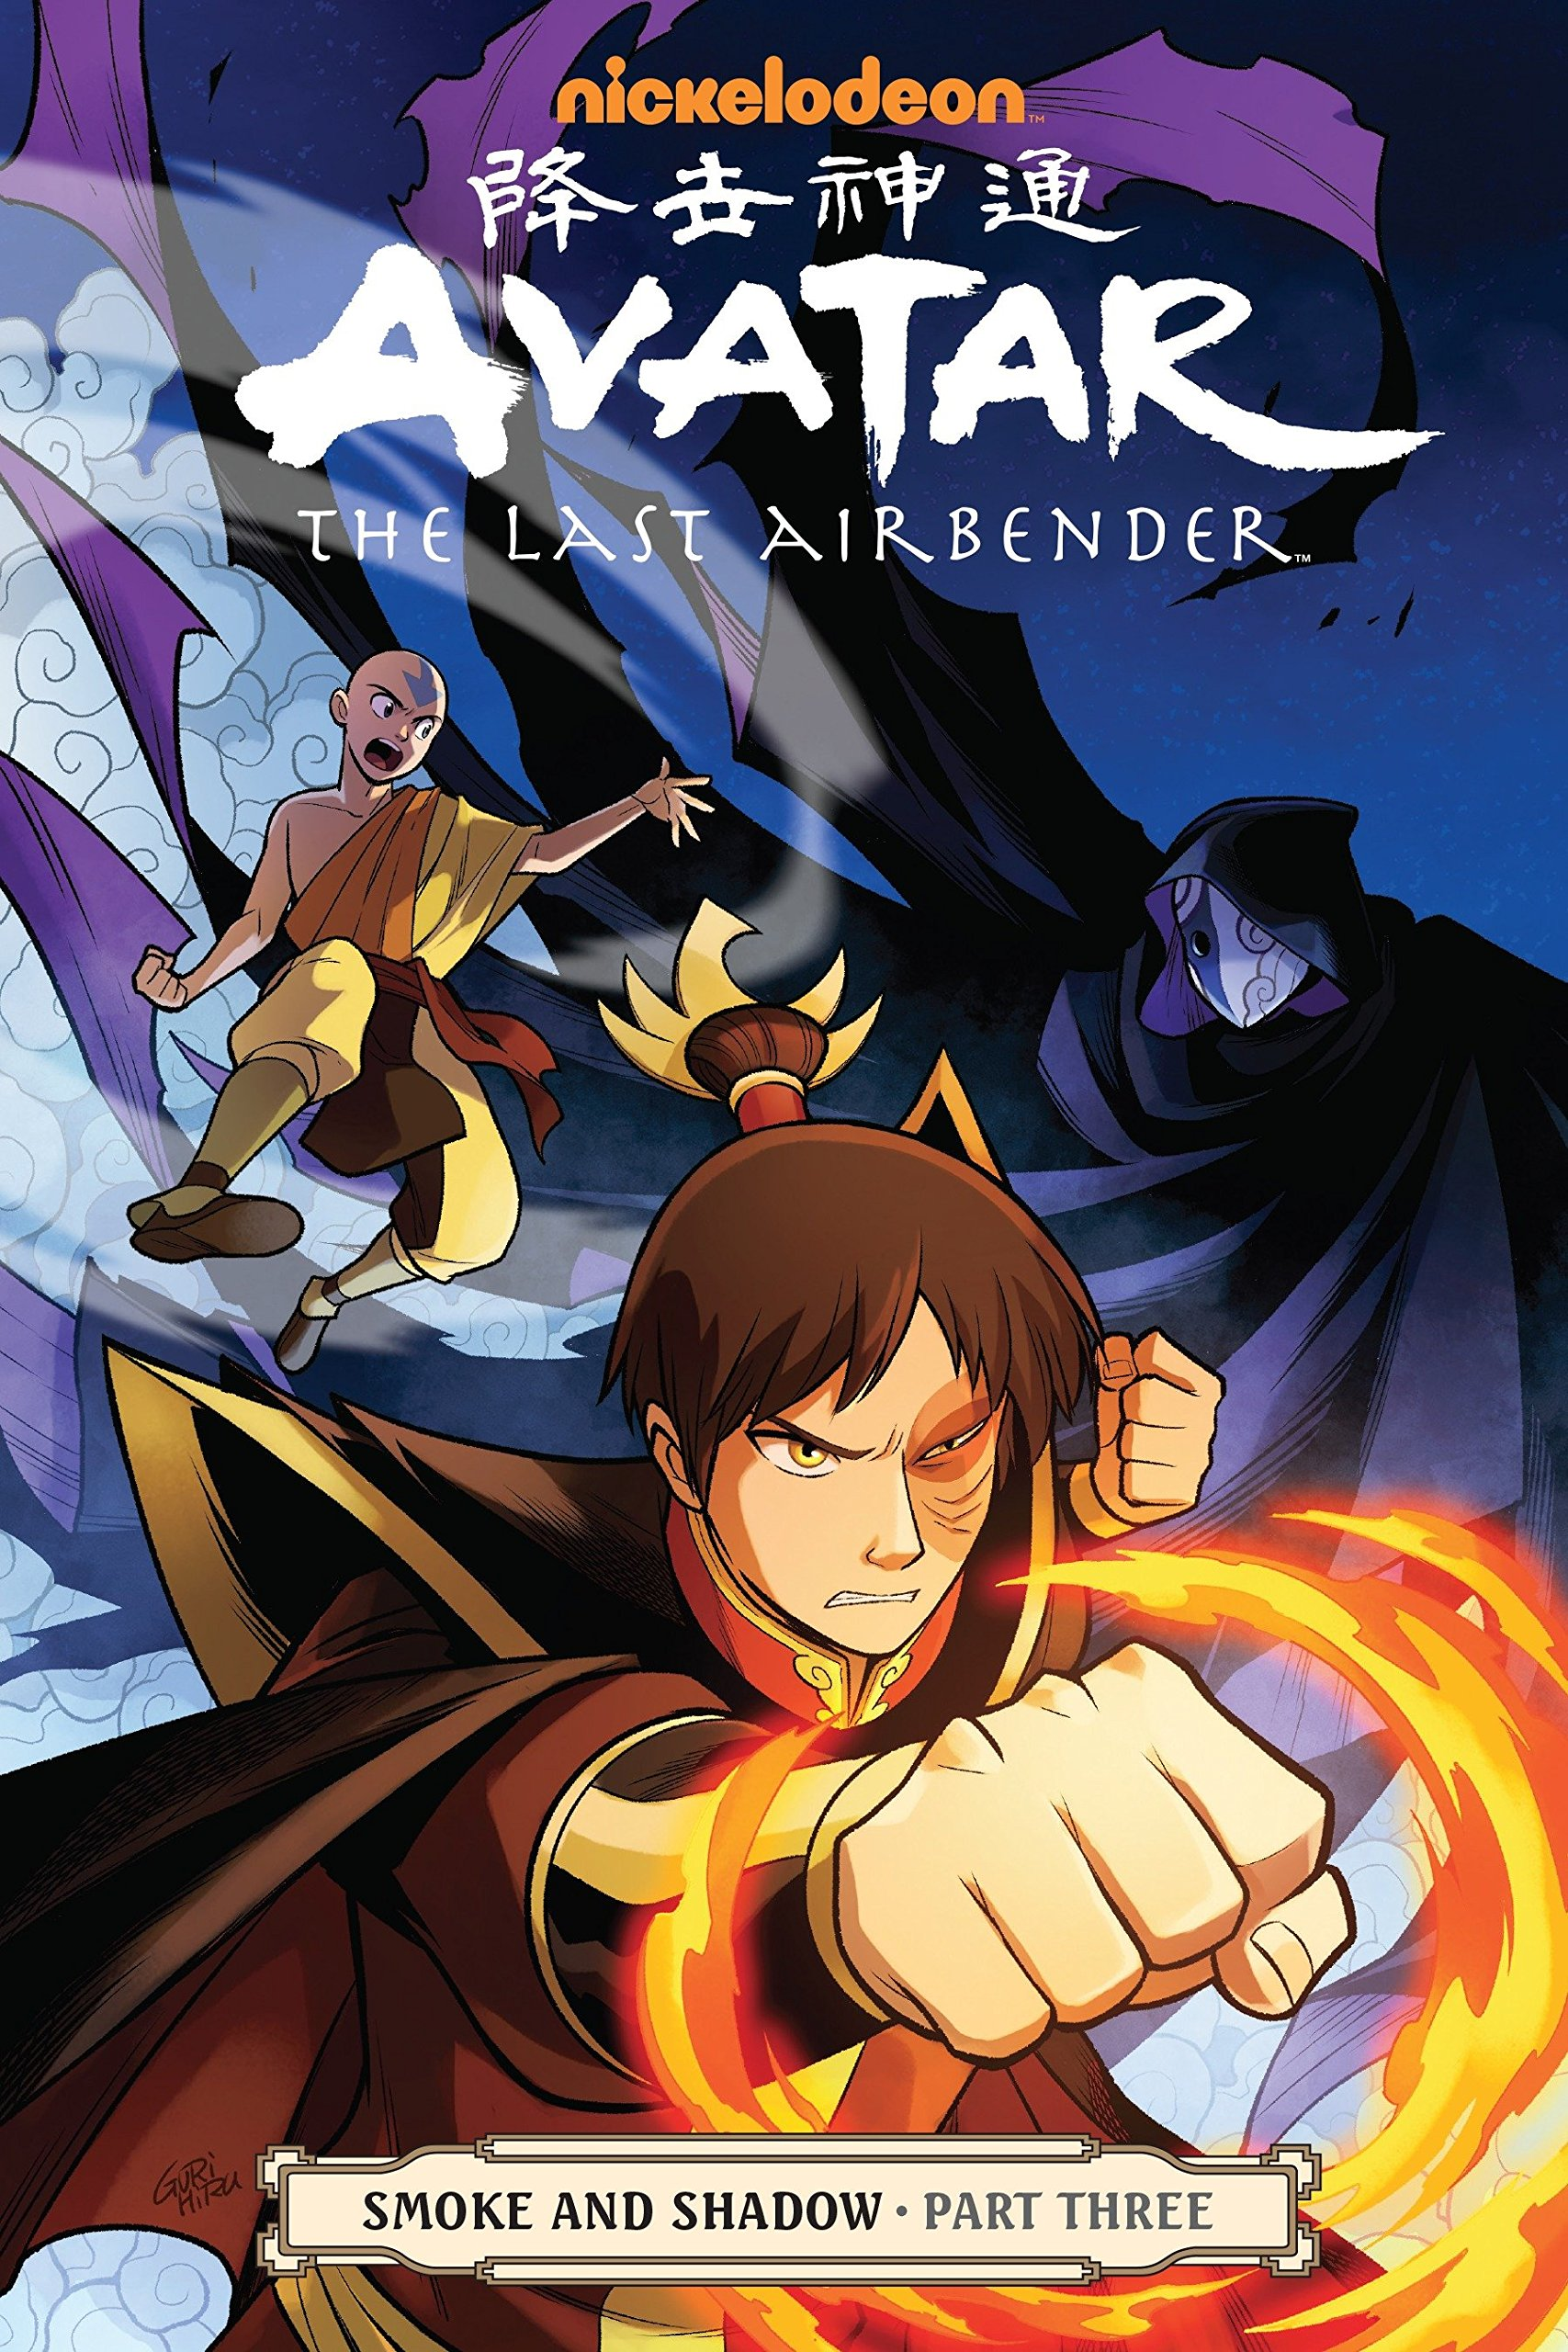 Avatar: The Last Airbender-Smoke and Shadow Part Three Paperback – April 12, 2016 Gene Luen Yang Gurihiru Dark Horse Books 1616558385